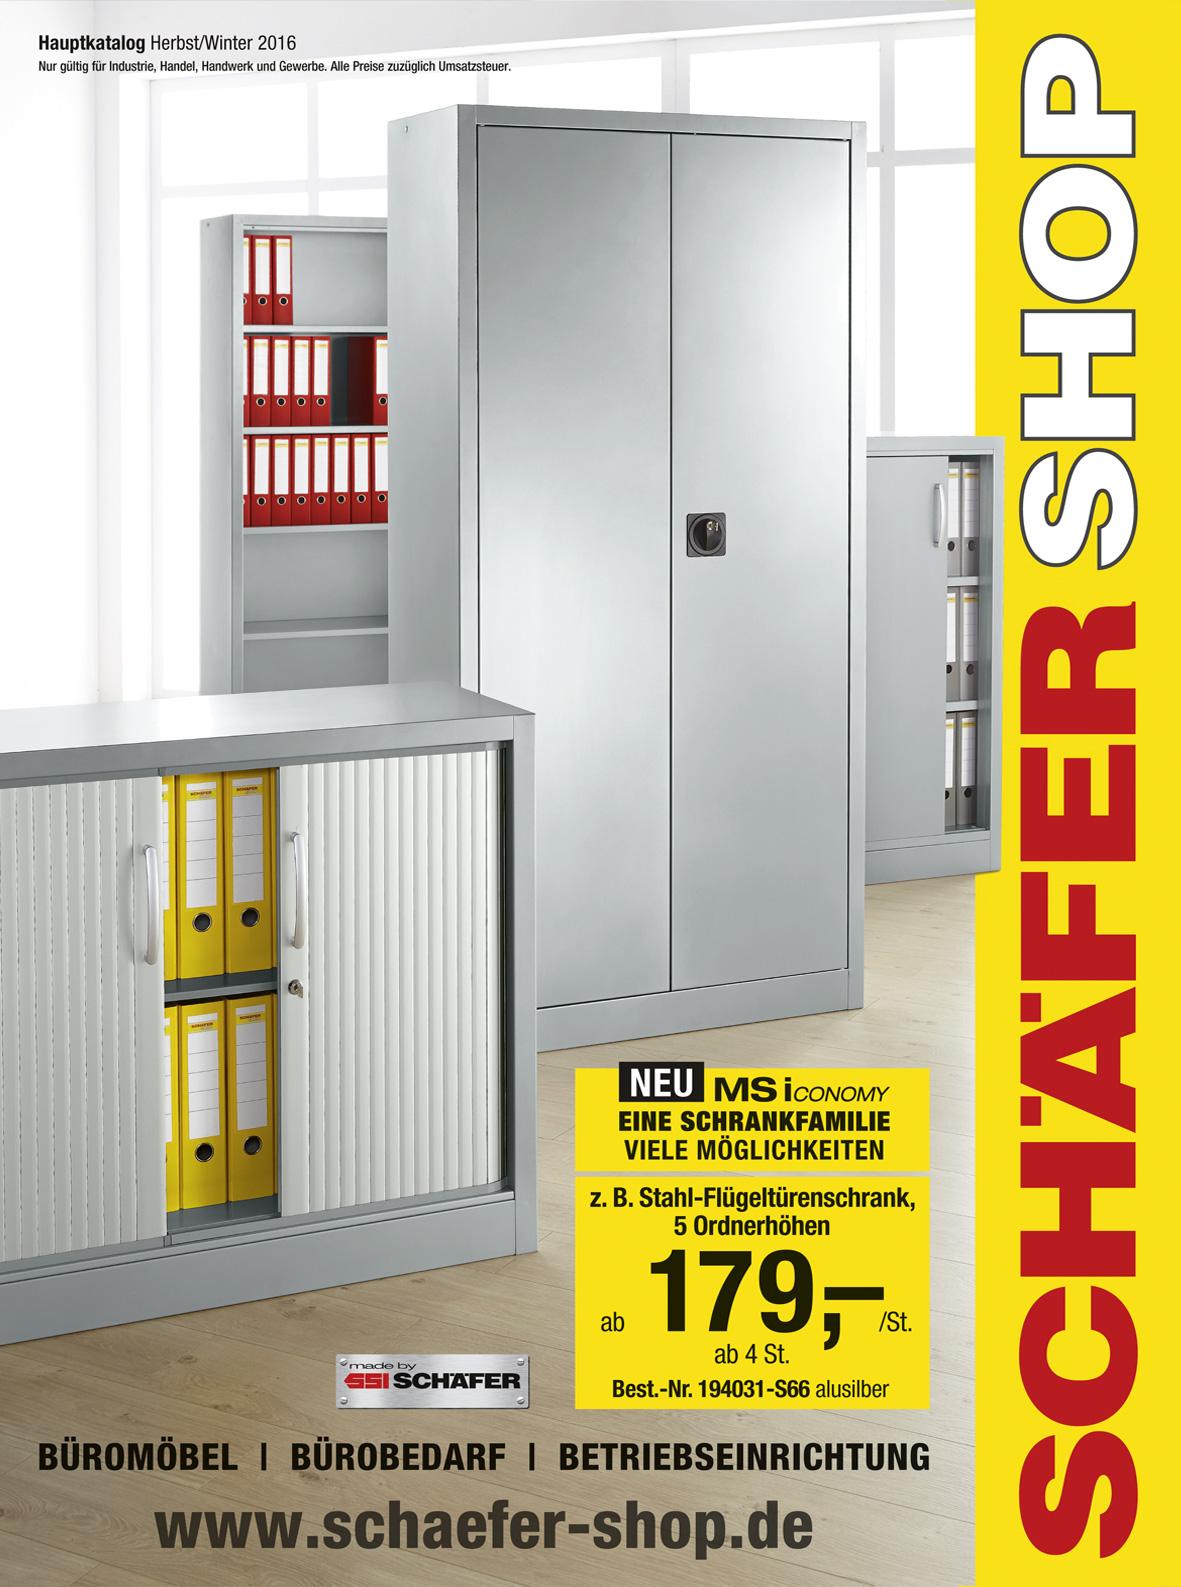 Schäfer-Shop Bürobedarf Kataloge bestellen